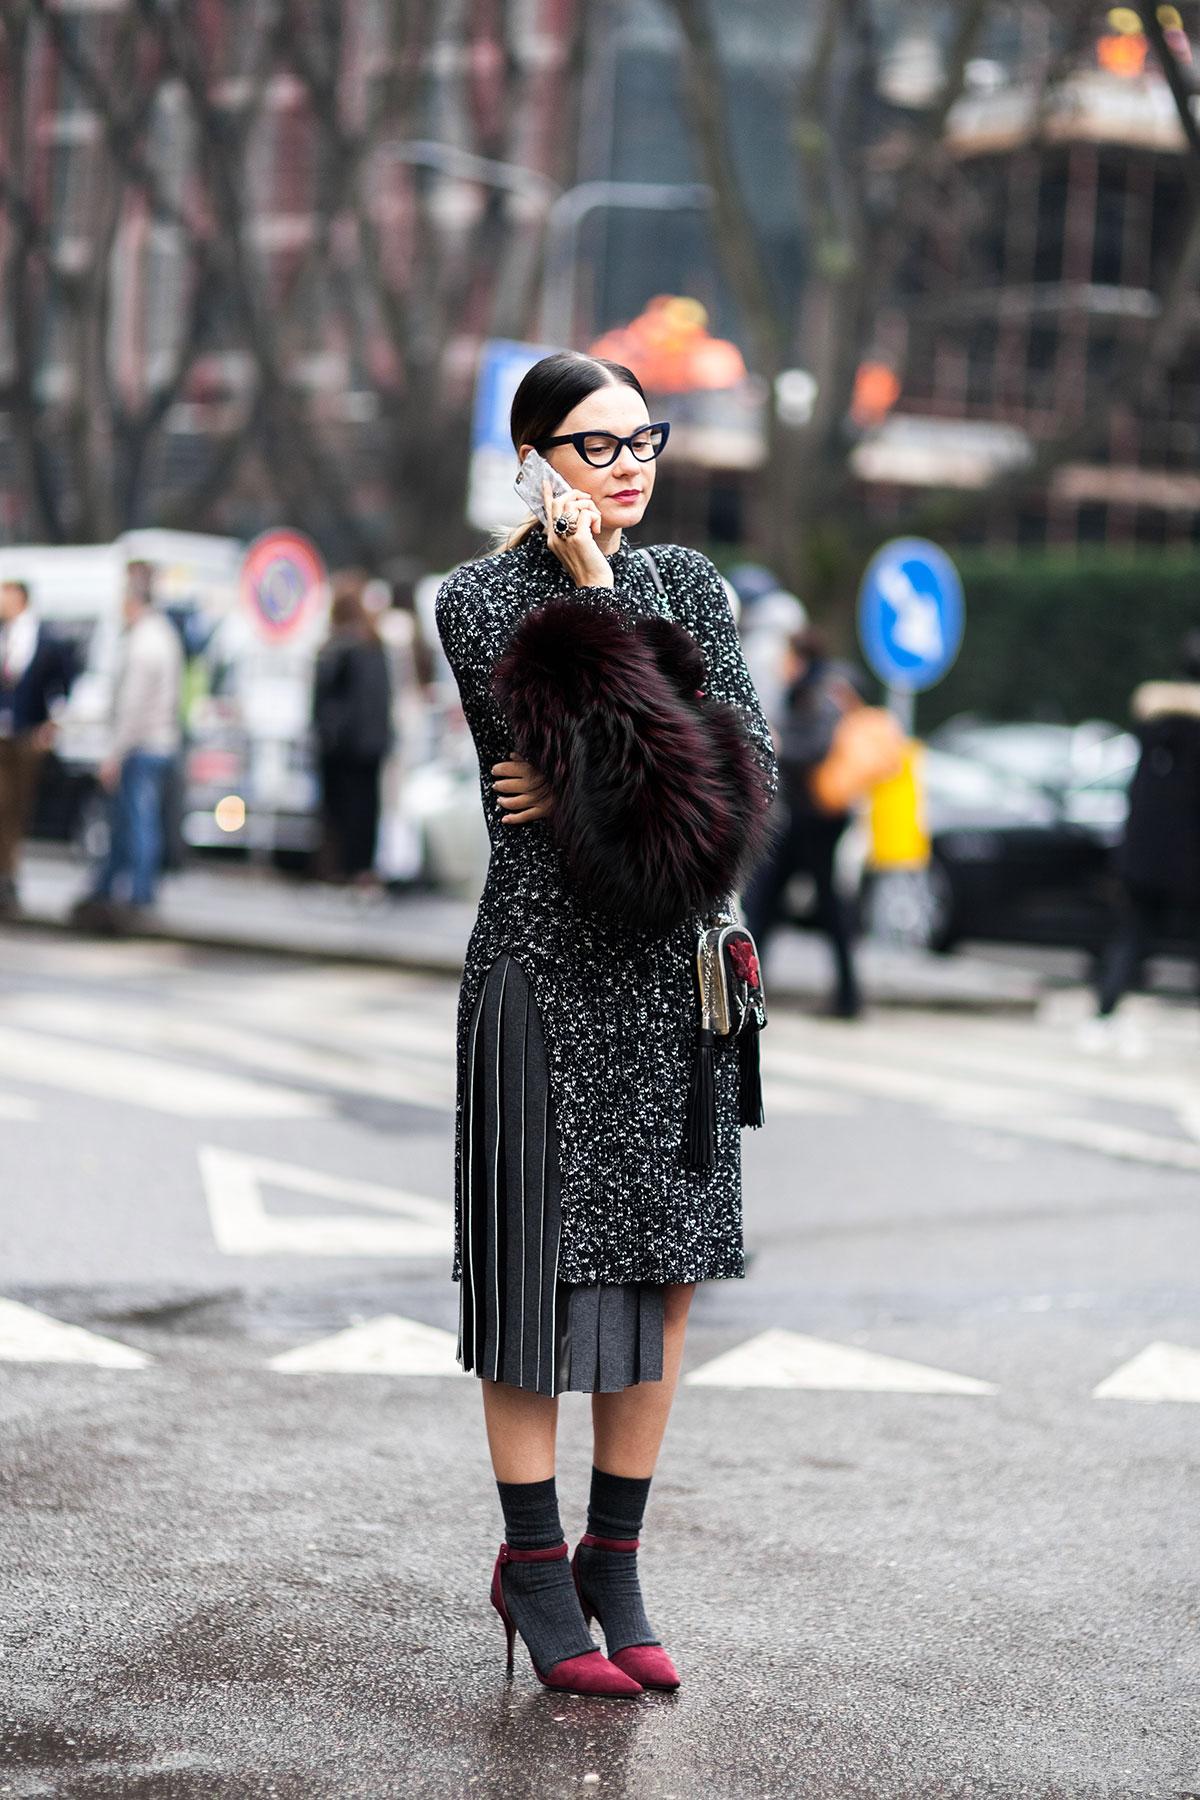 ShotByGio-George-Angelis-Woman-Skirt-Heels-And-Socks-Milan-Fashion-Week-Fall-Winter-2015-2016-Street-Style-7805